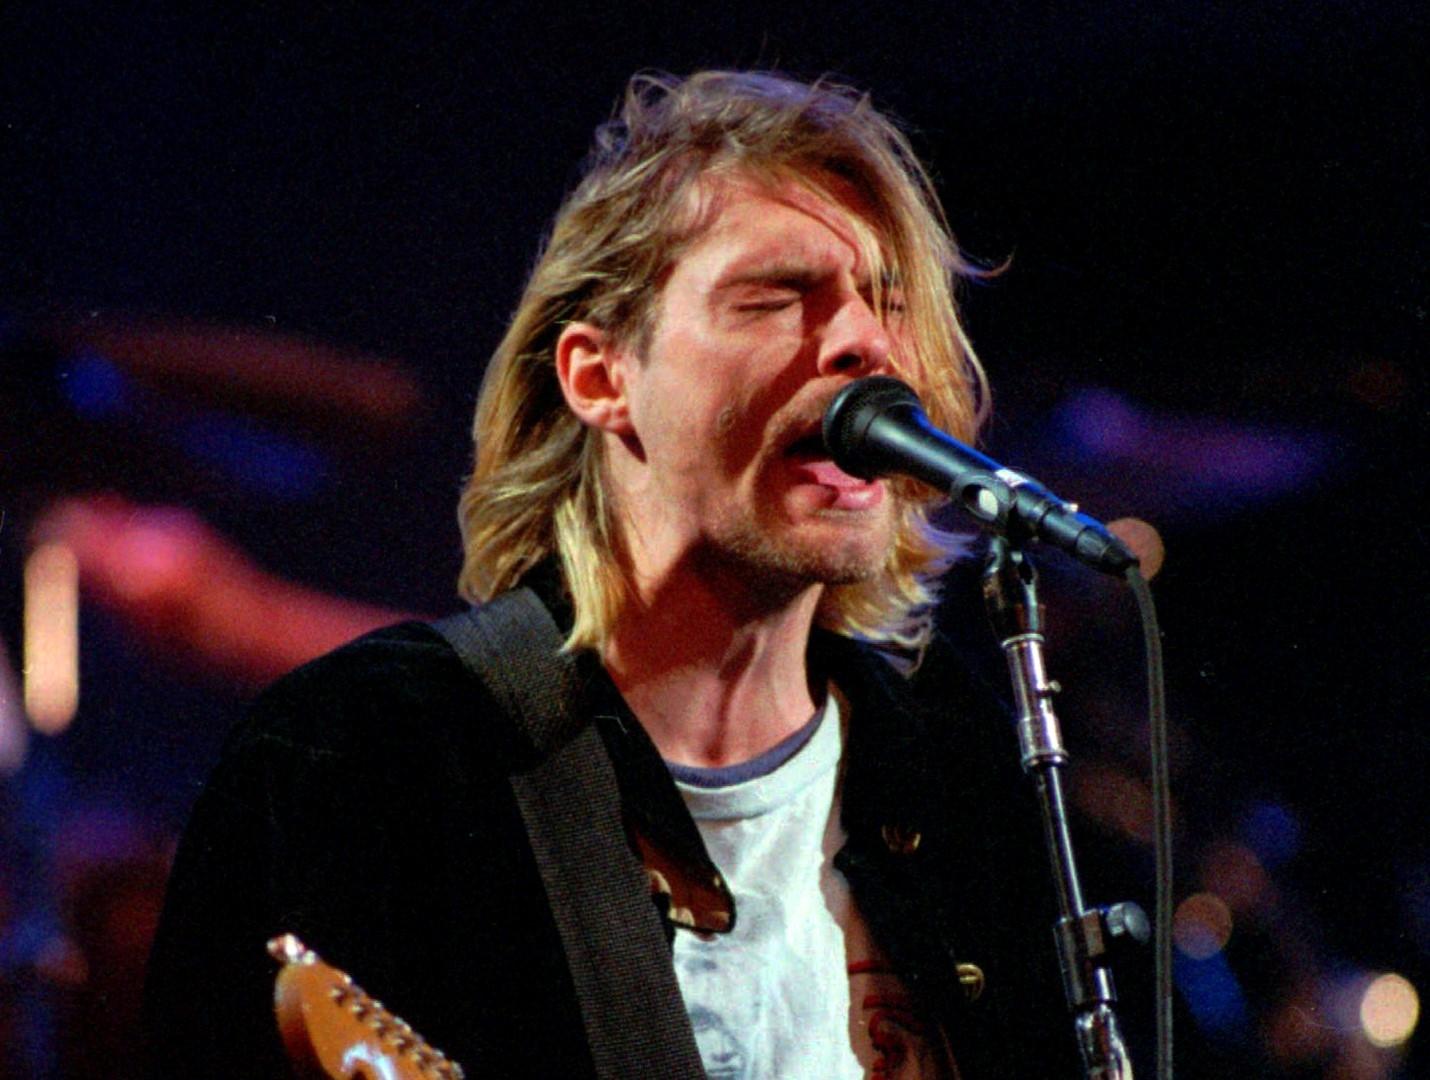 Se busca: Guitarra que usó Kurt Cobain en MTV Unplugged está perdida